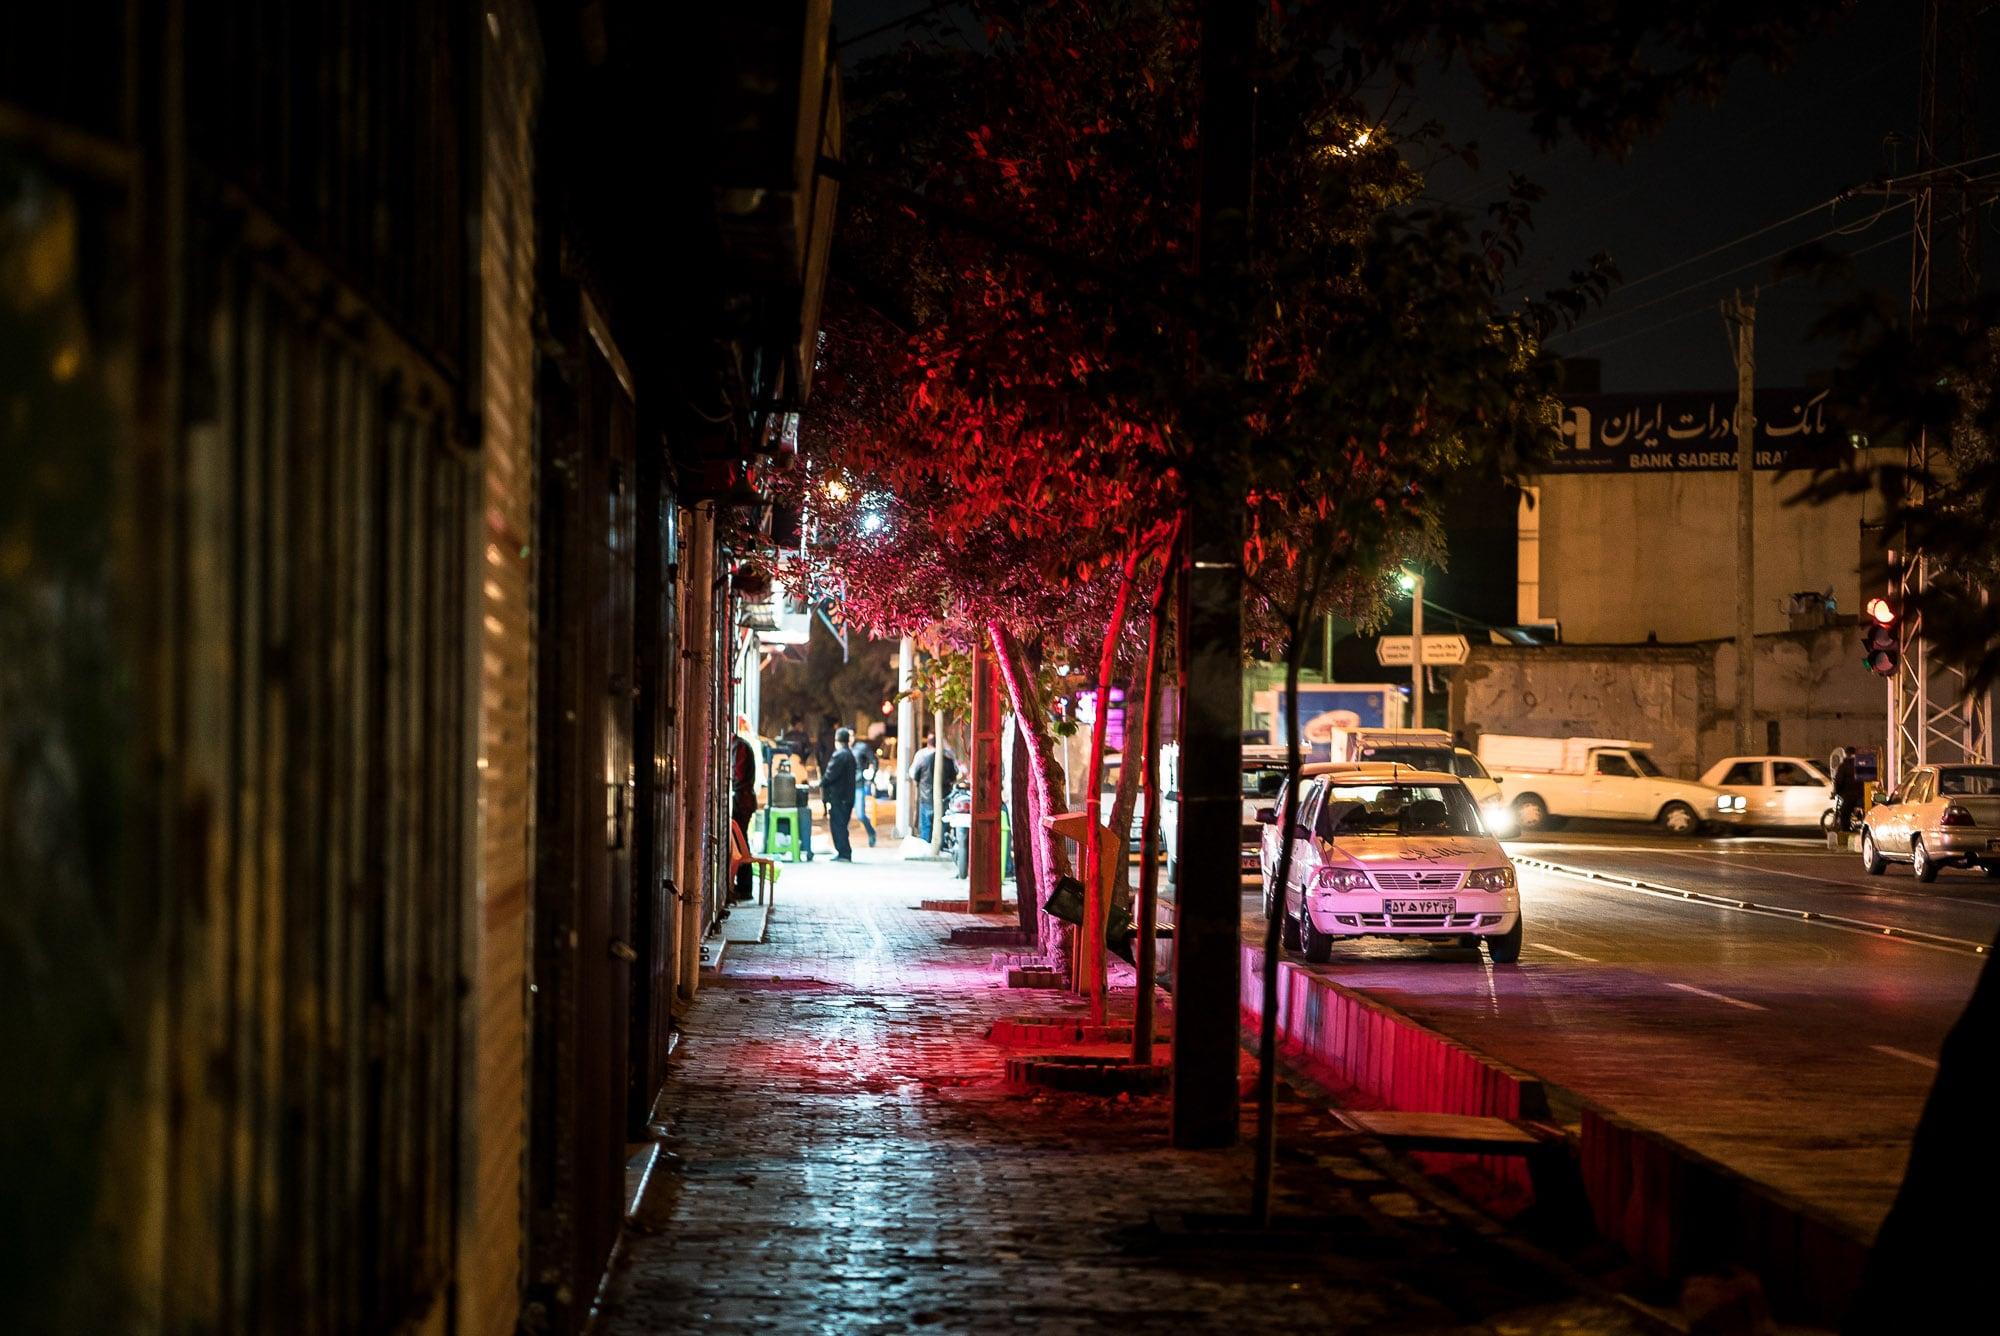 sidewalk in Mashhad